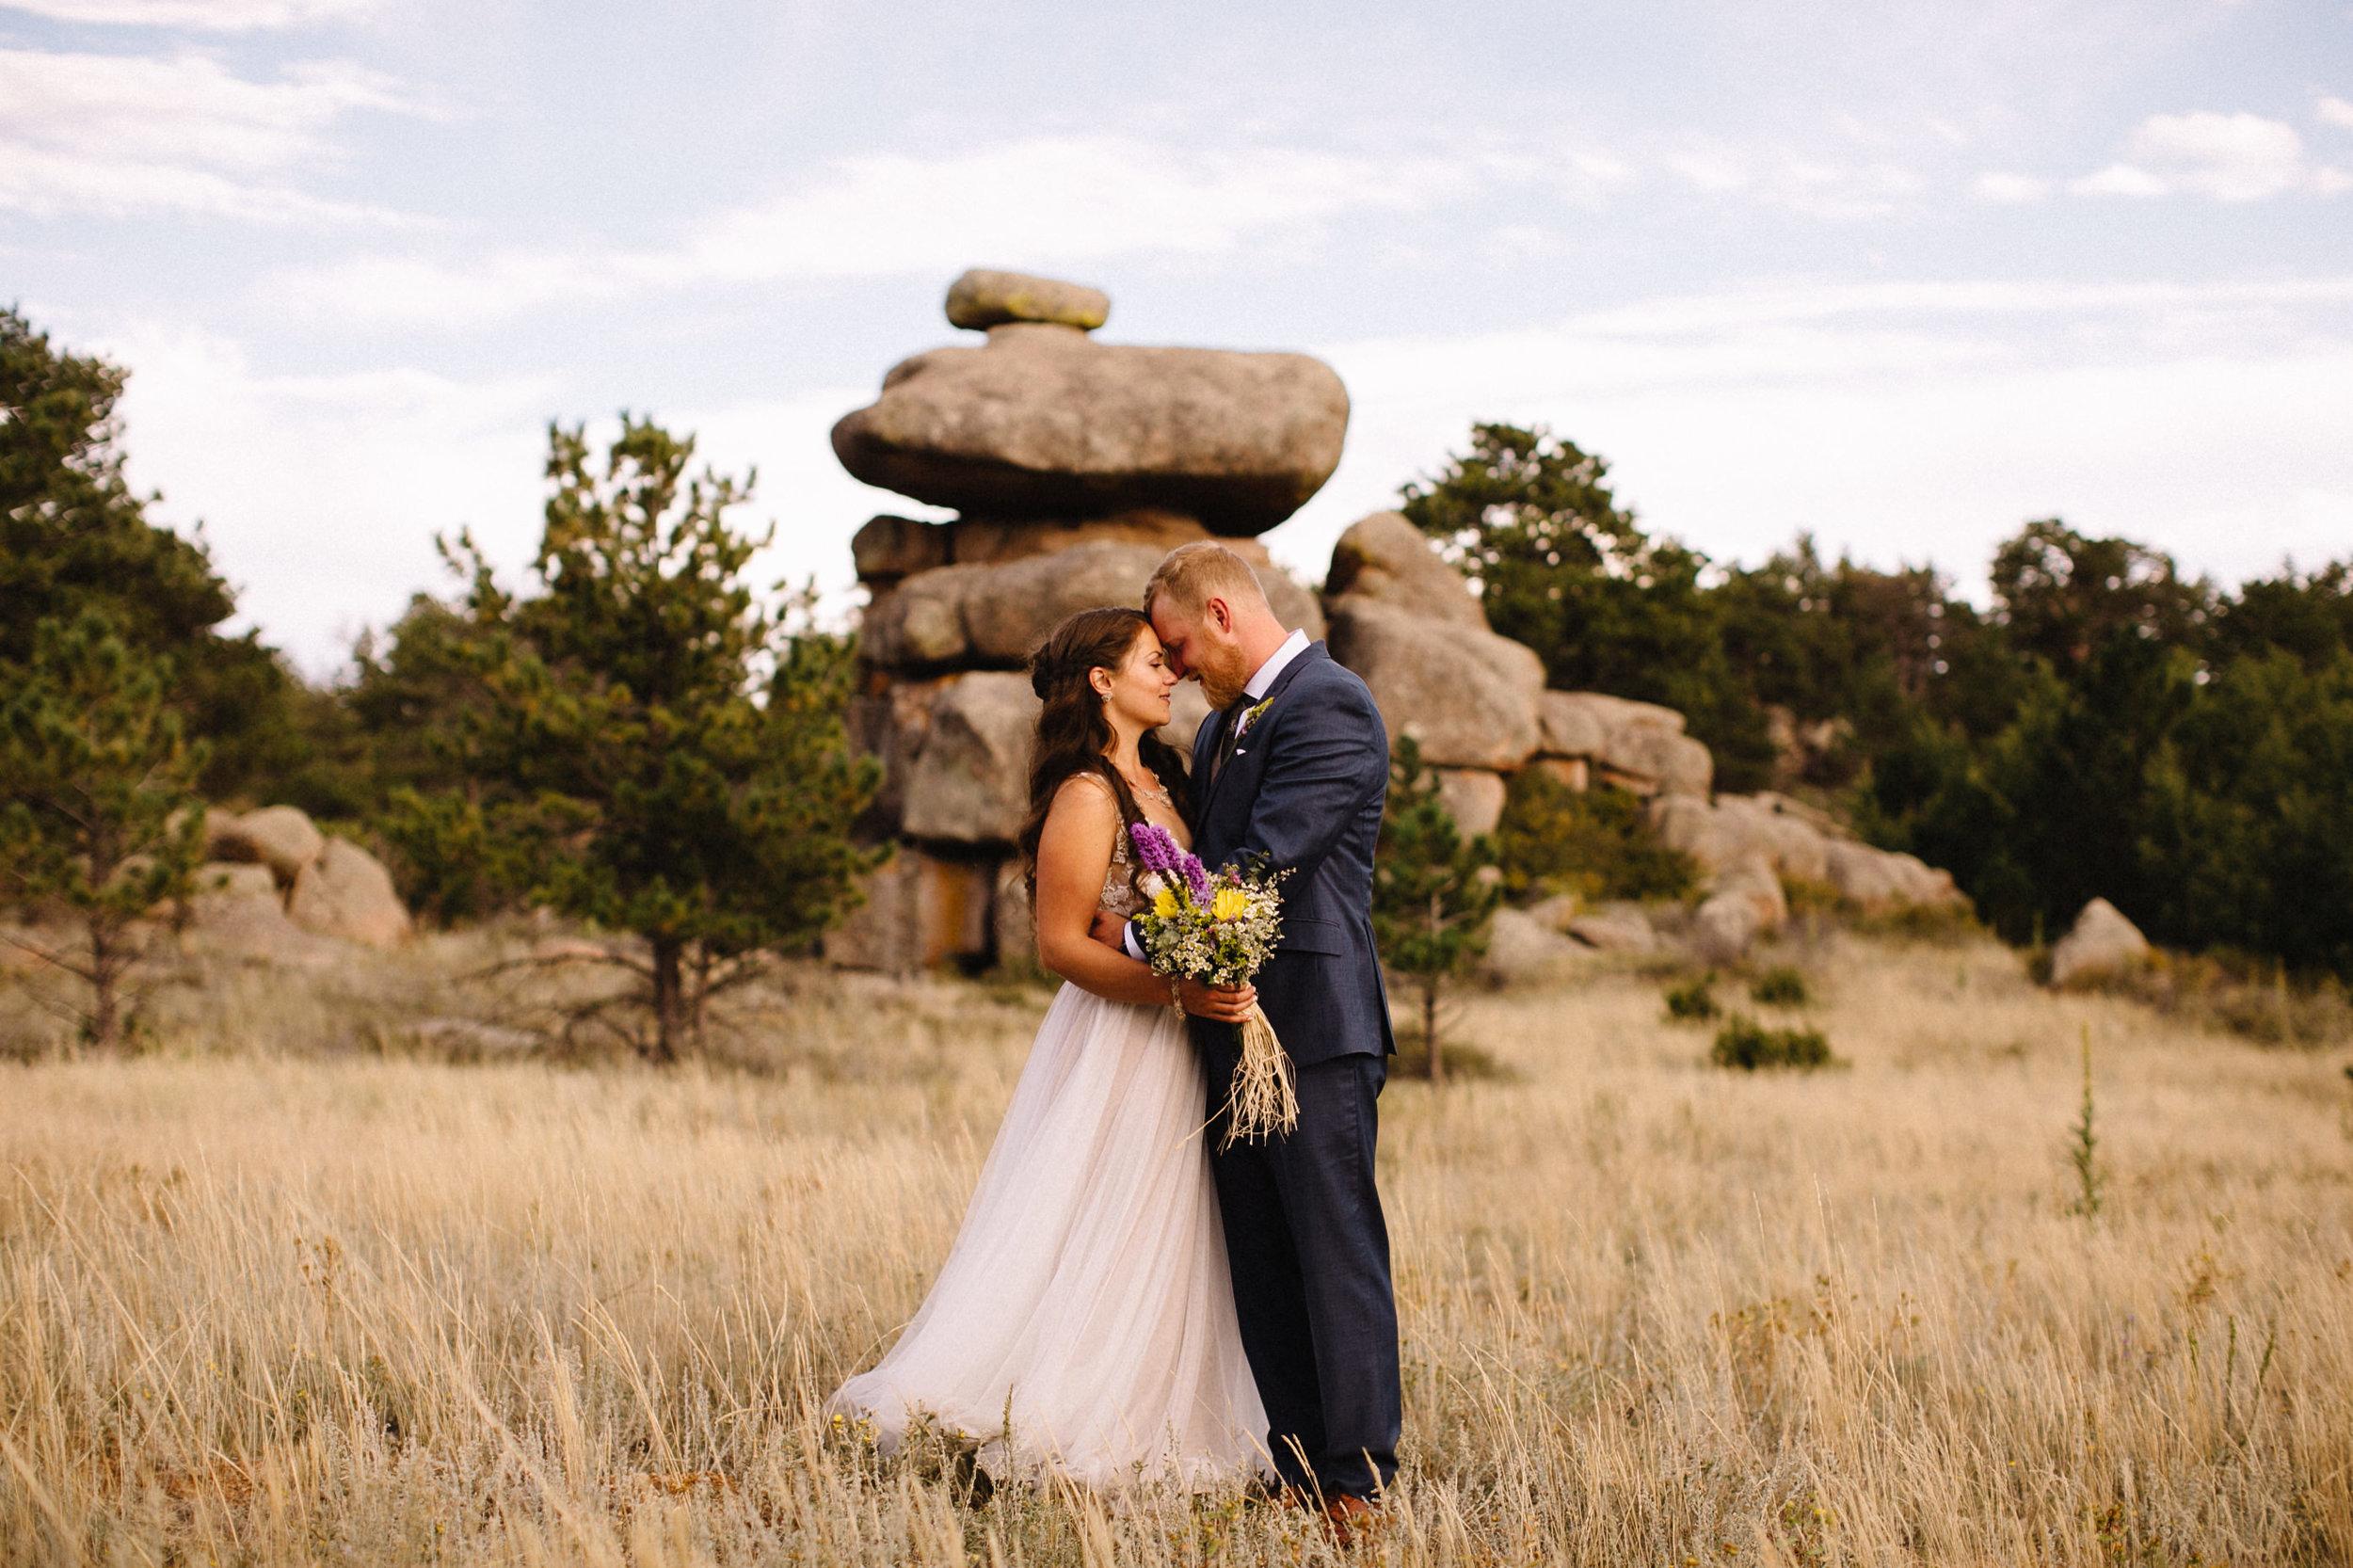 Liz Osban Photography Vedauwoo Buford Wyoming Happy Jack Wedding Elopement Destination Small Forest Cheyenne Laramie Medicine Bow National Forest Portraits Sarah Taylor11.jpg